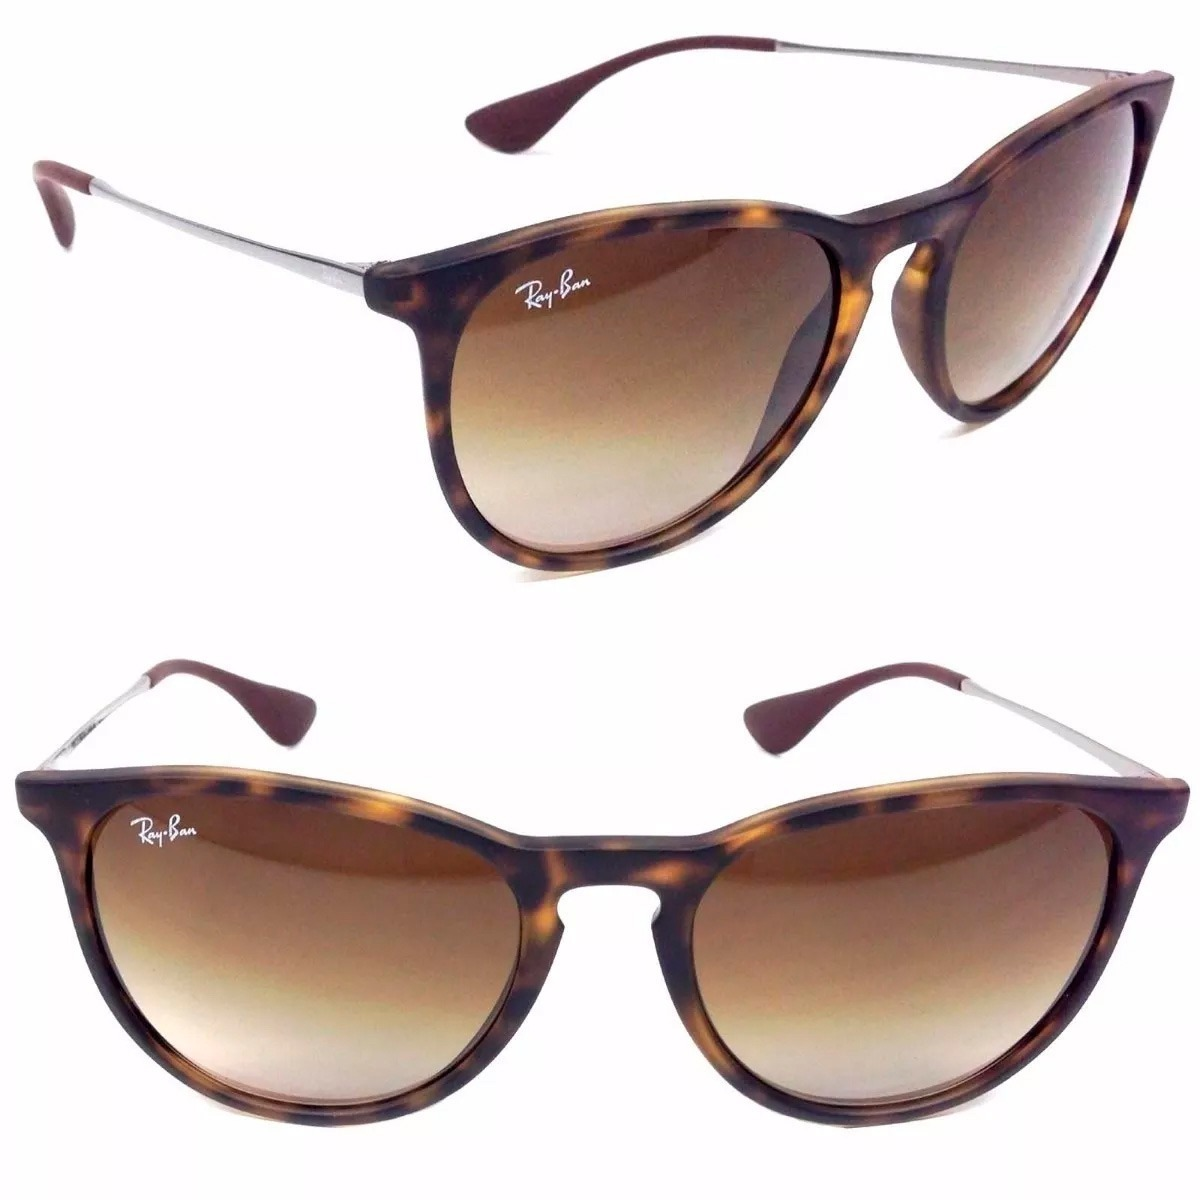 be5d78ef9 óculos d sol ray ban erika rb4171 gatinha marrom feminino. Carregando zoom.